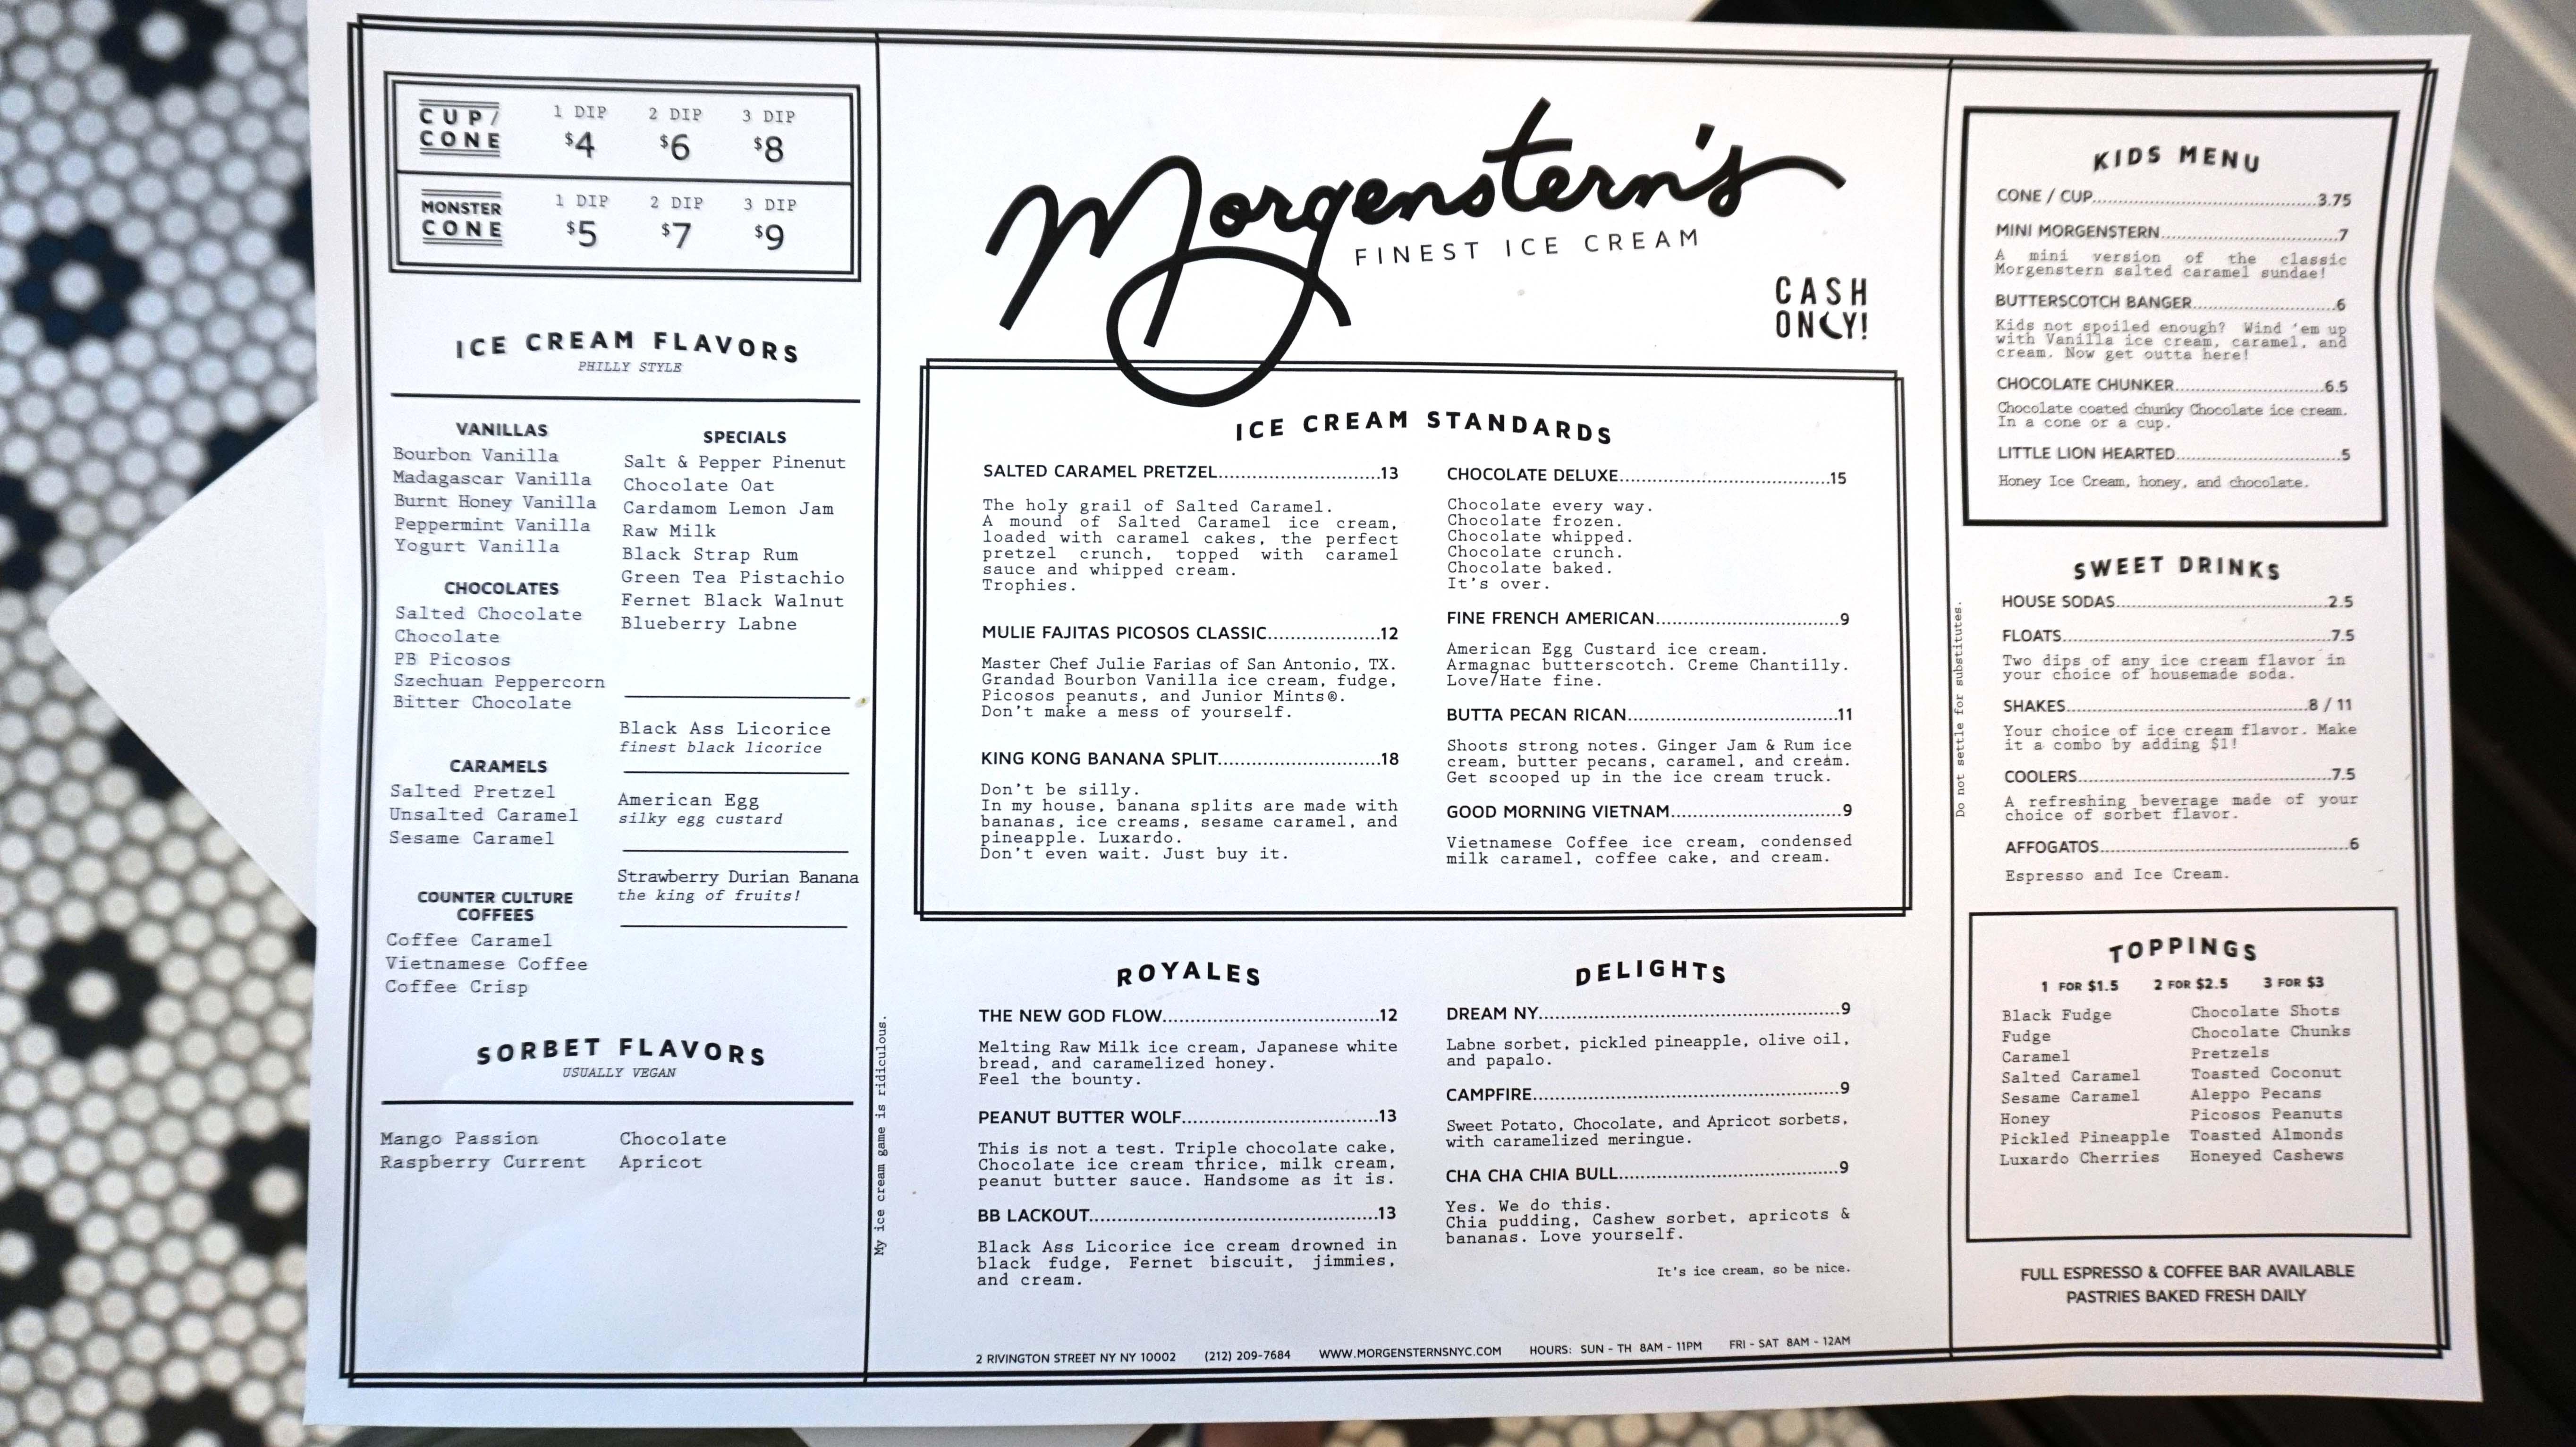 Morgensterns menu